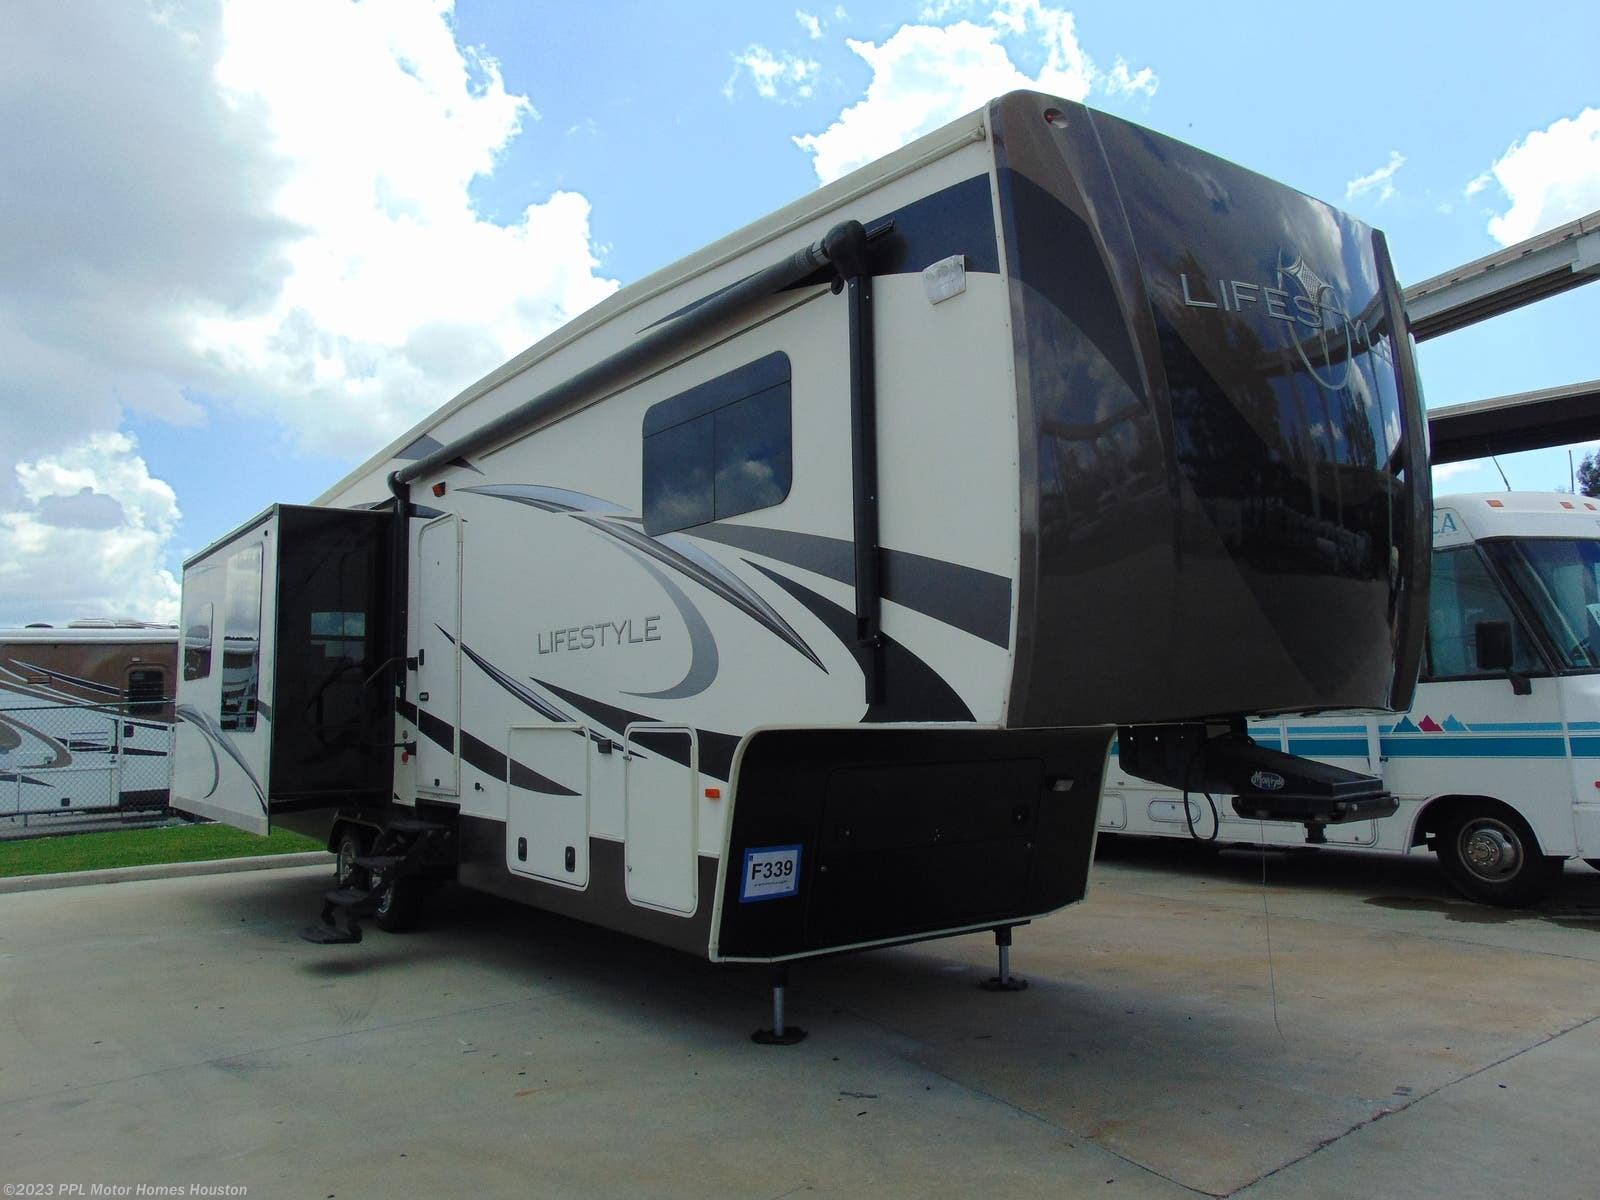 Used Rv Houston >> 2015 Evergreen Rv Rv Lifestyle Luxury Ls37cksl For Sale In Houston Tx 77074 F339